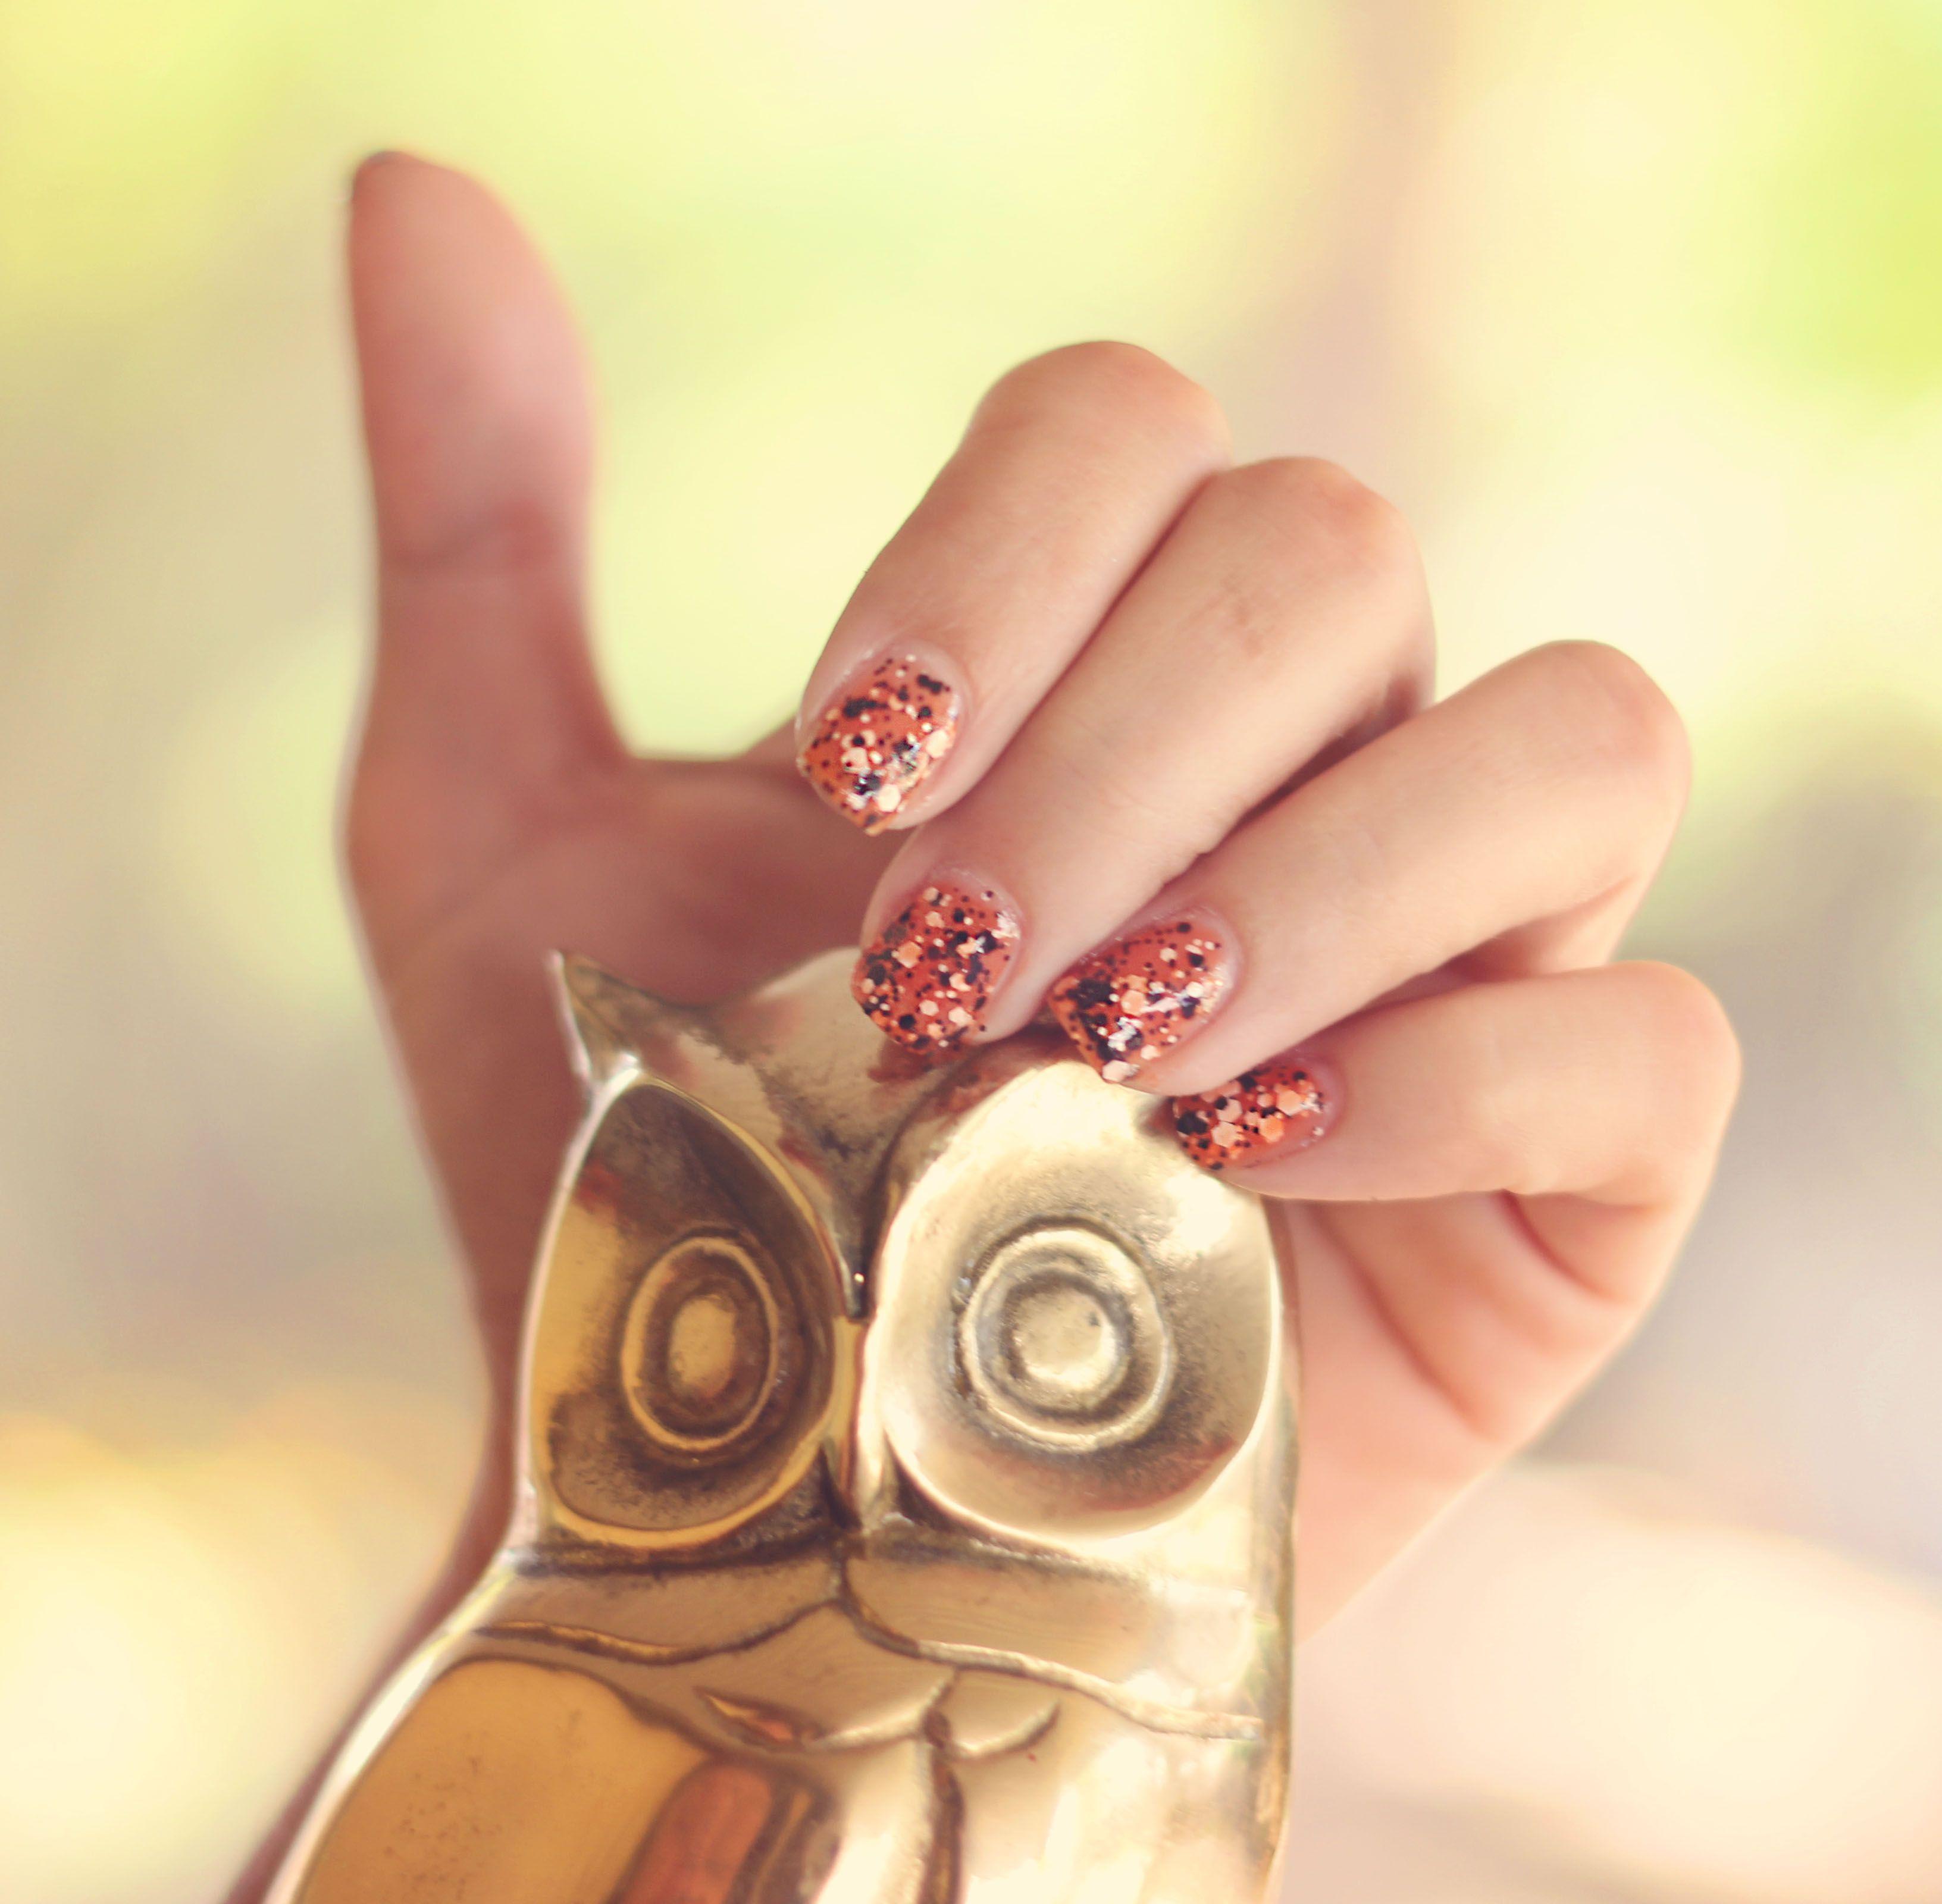 Easy halloween nails cute orange black polka dot polish by halloween nails cute orange black polka dot polish by maybelline nails lacquer pinterest easy halloween nails maybelline and manicure ideas solutioingenieria Choice Image